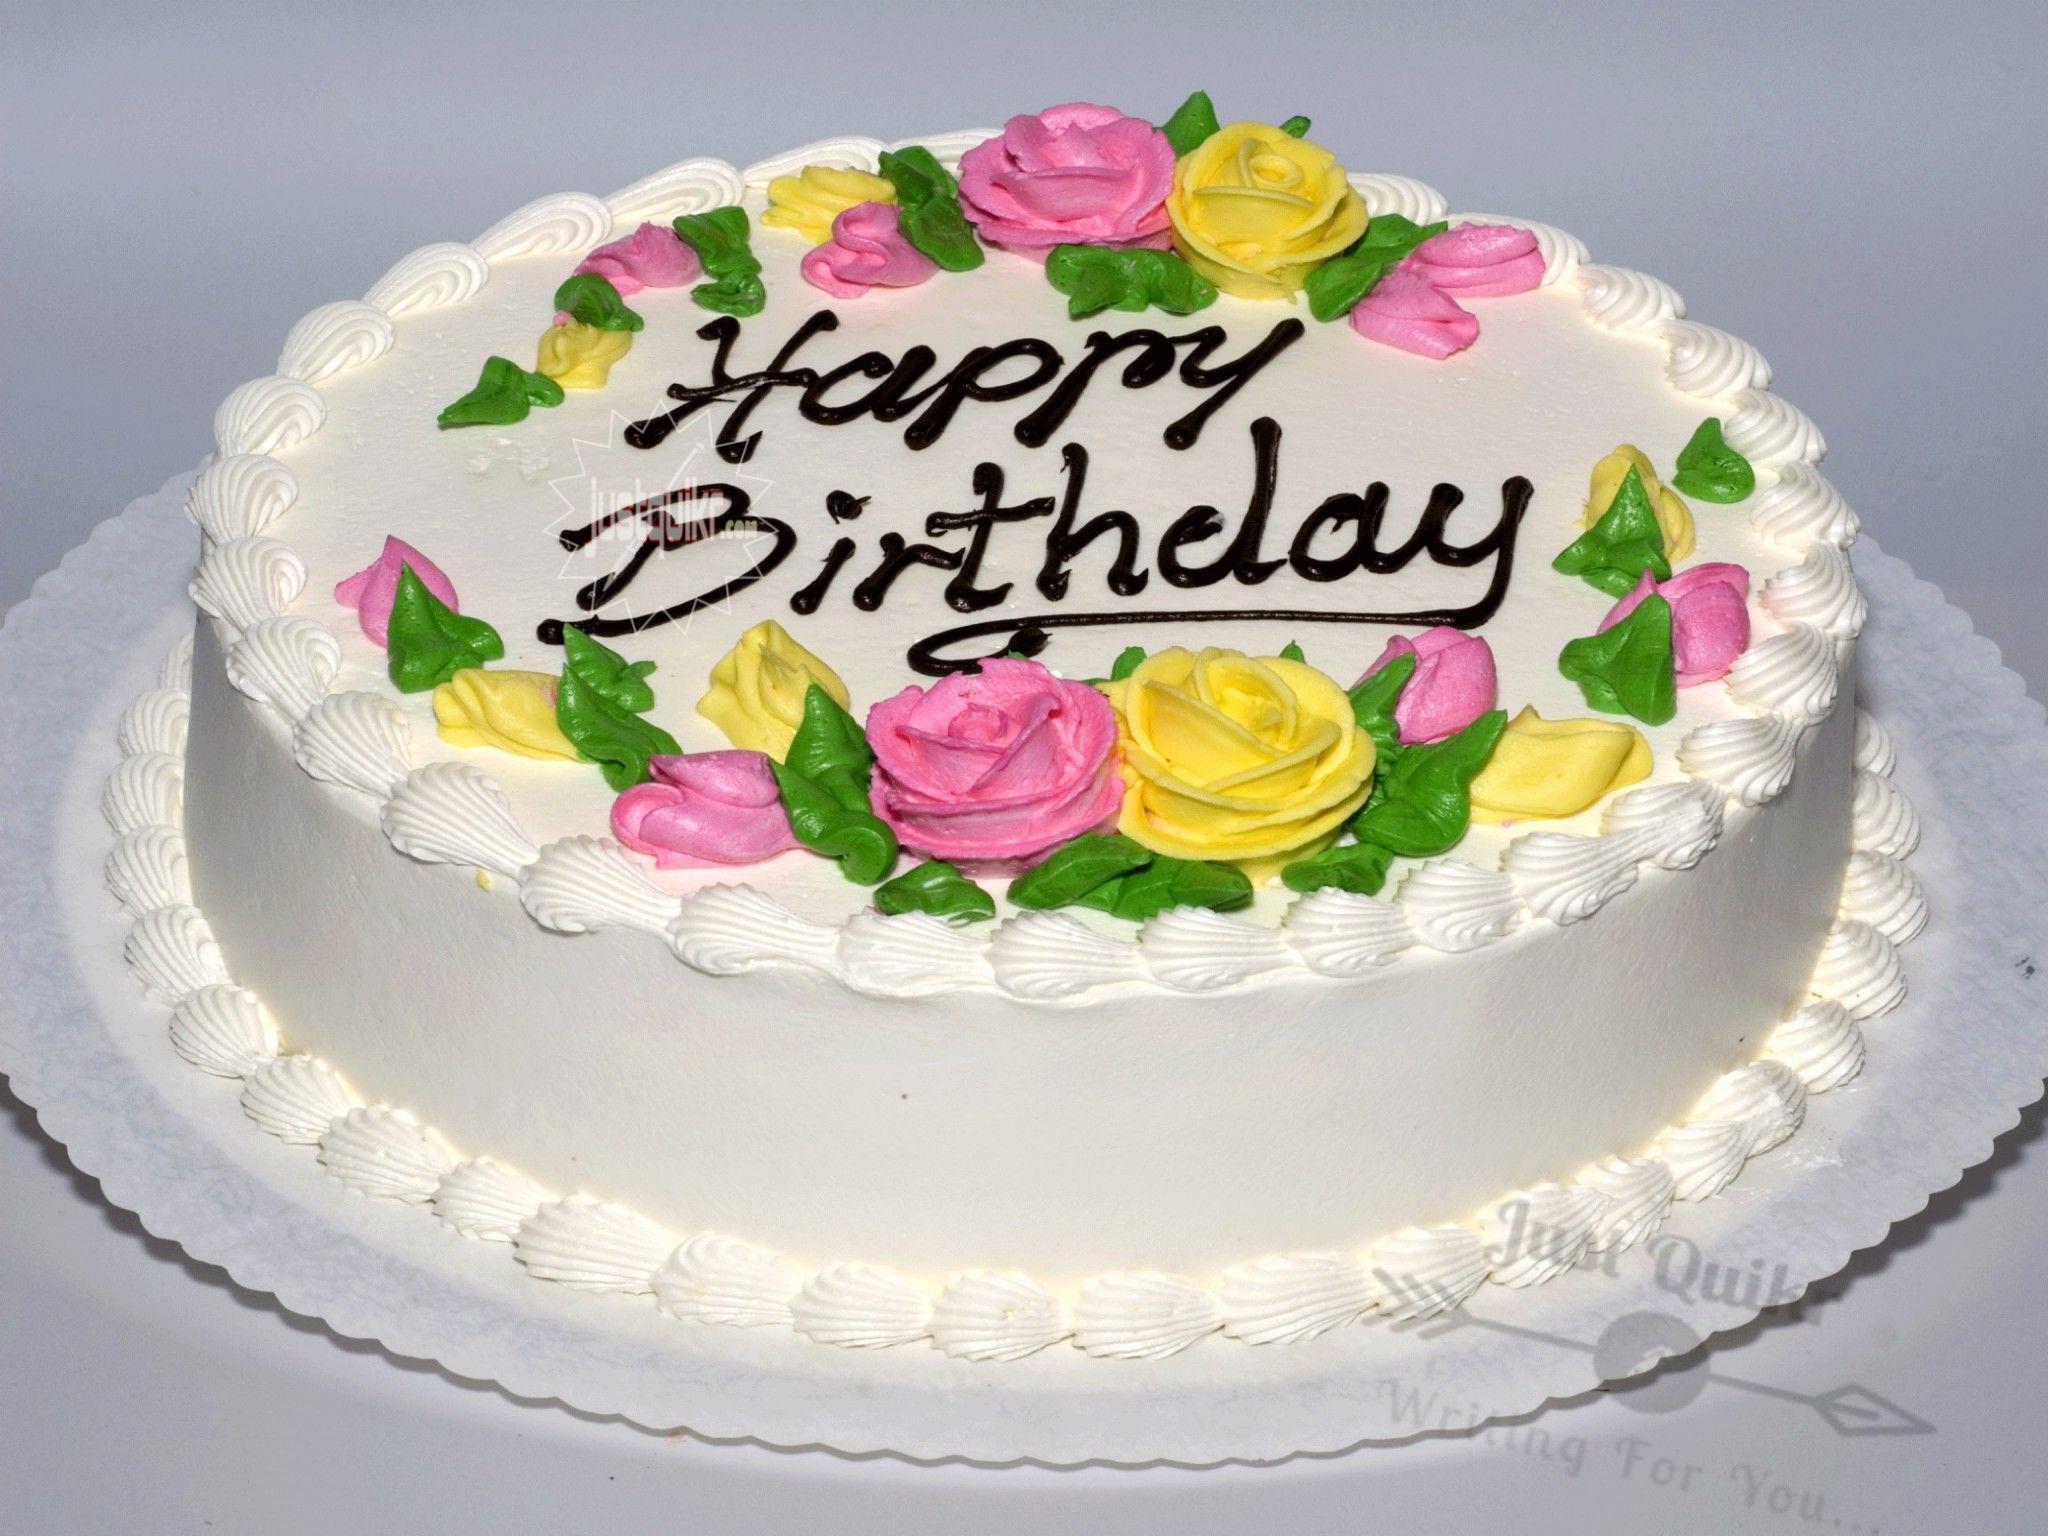 Creative Happy Birthday Wishing Cake Status Images for Office Staff